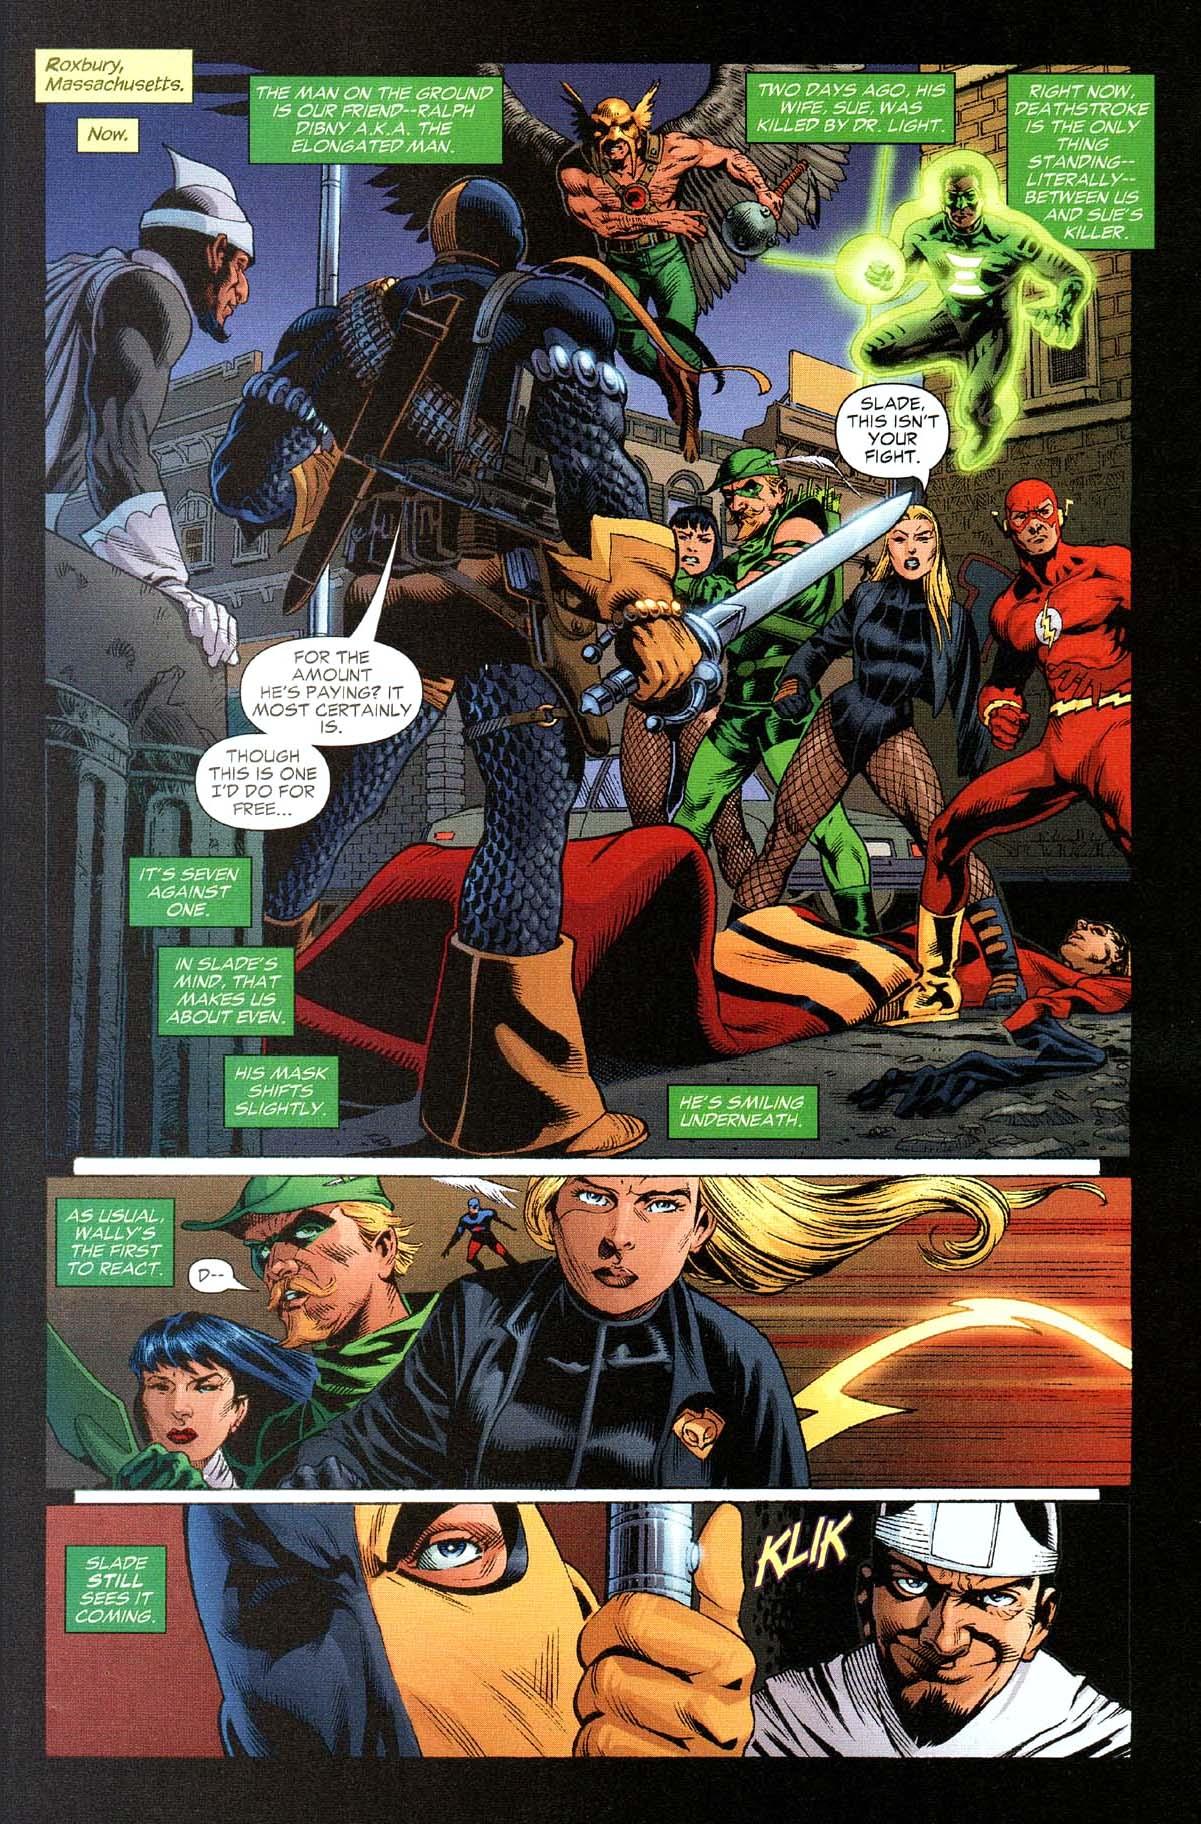 Deathstroke Takes Down The Flash | Comicnewbies | 1201 x 1824 jpeg 412kB